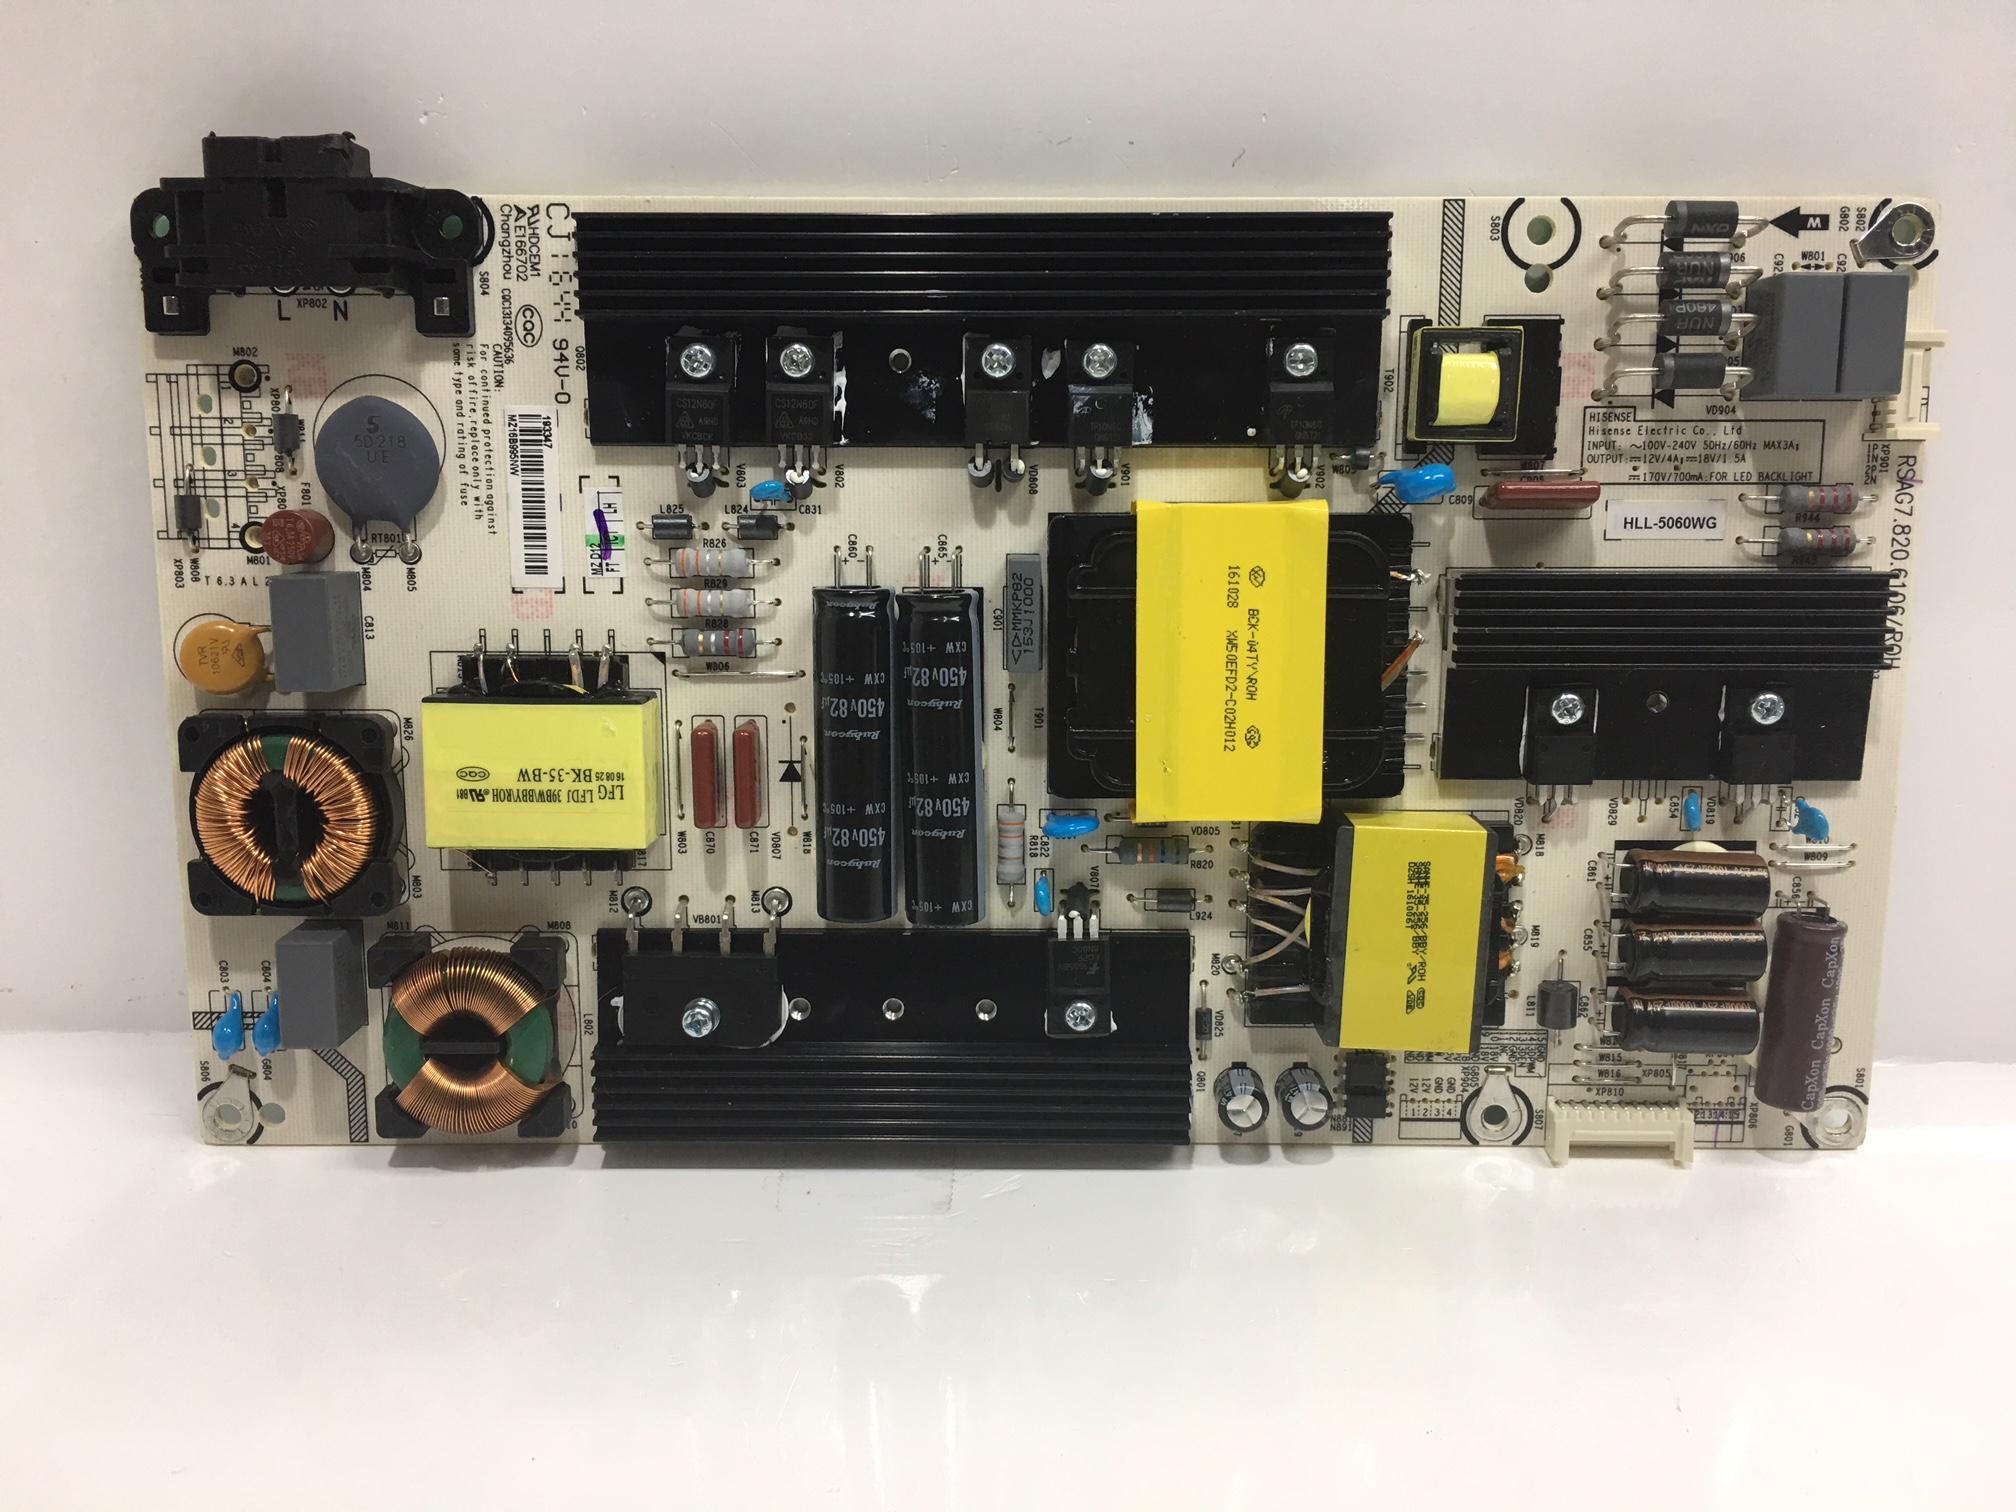 Hisense 193347 (RSAG7.820.5687/ROH, HLL-4855WN) Power Supply